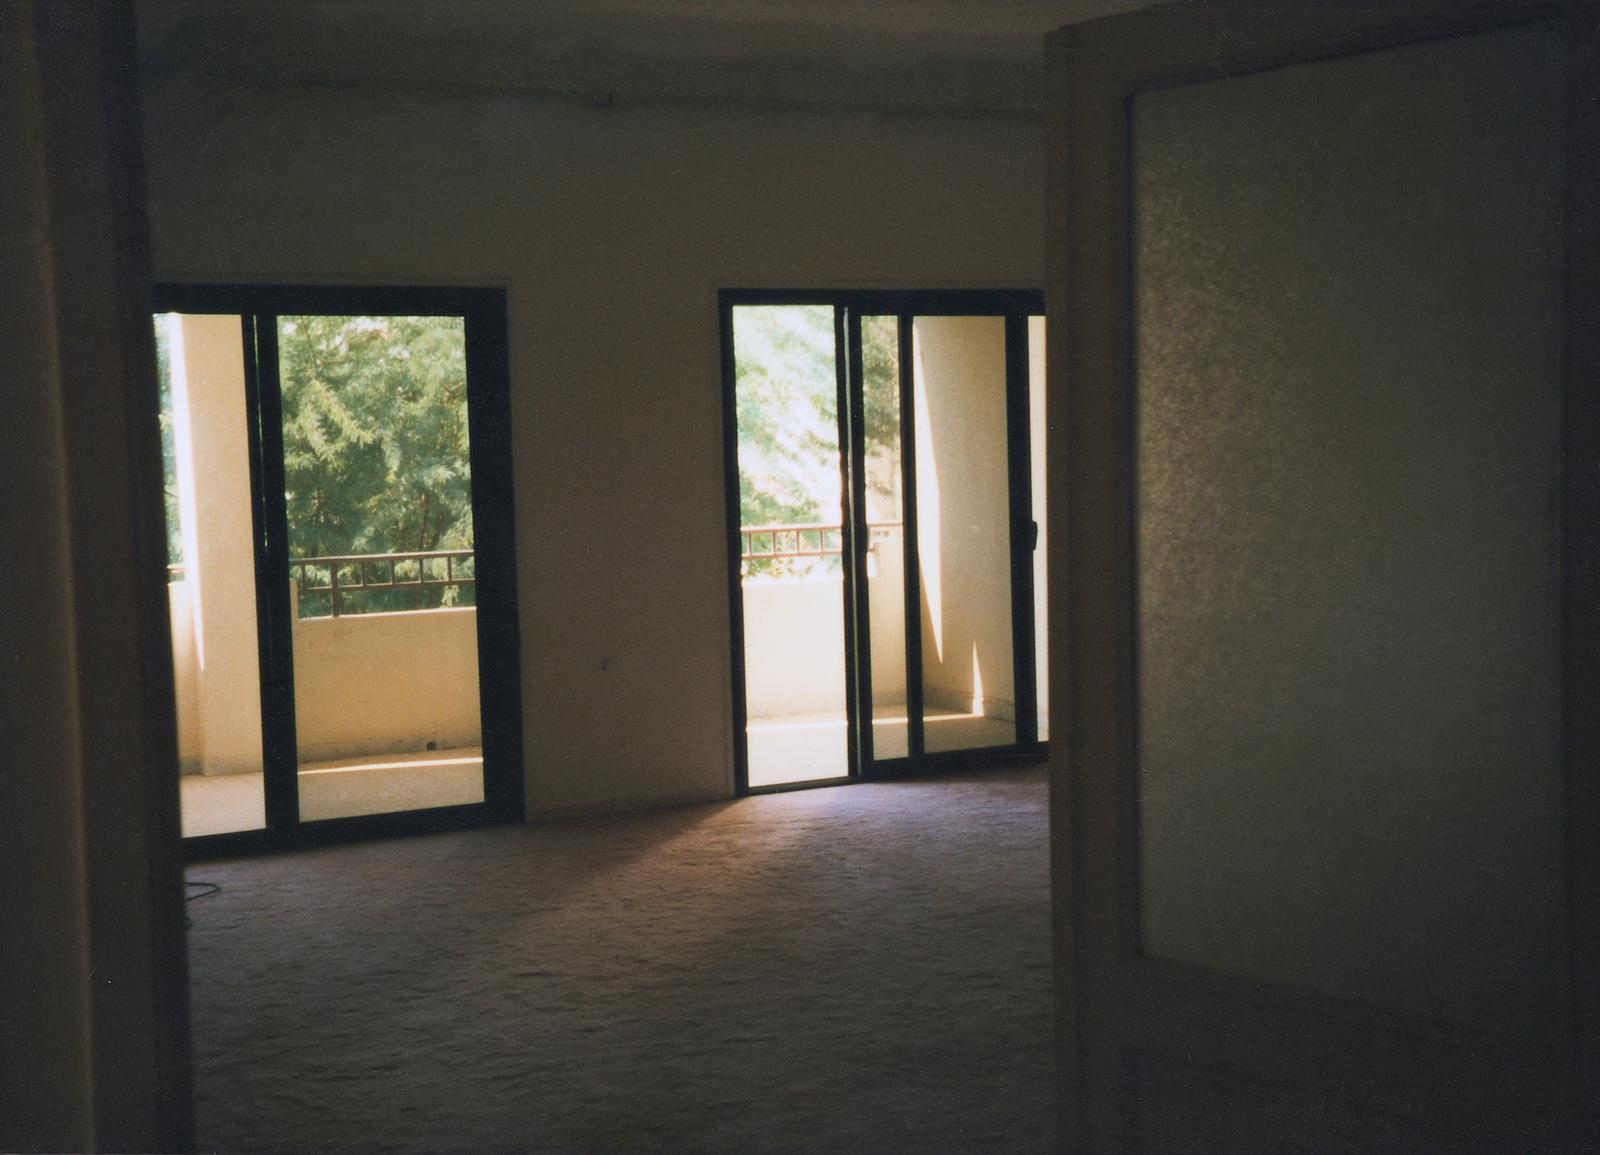 Abu Dhabi - Chancery Office Building - 1996